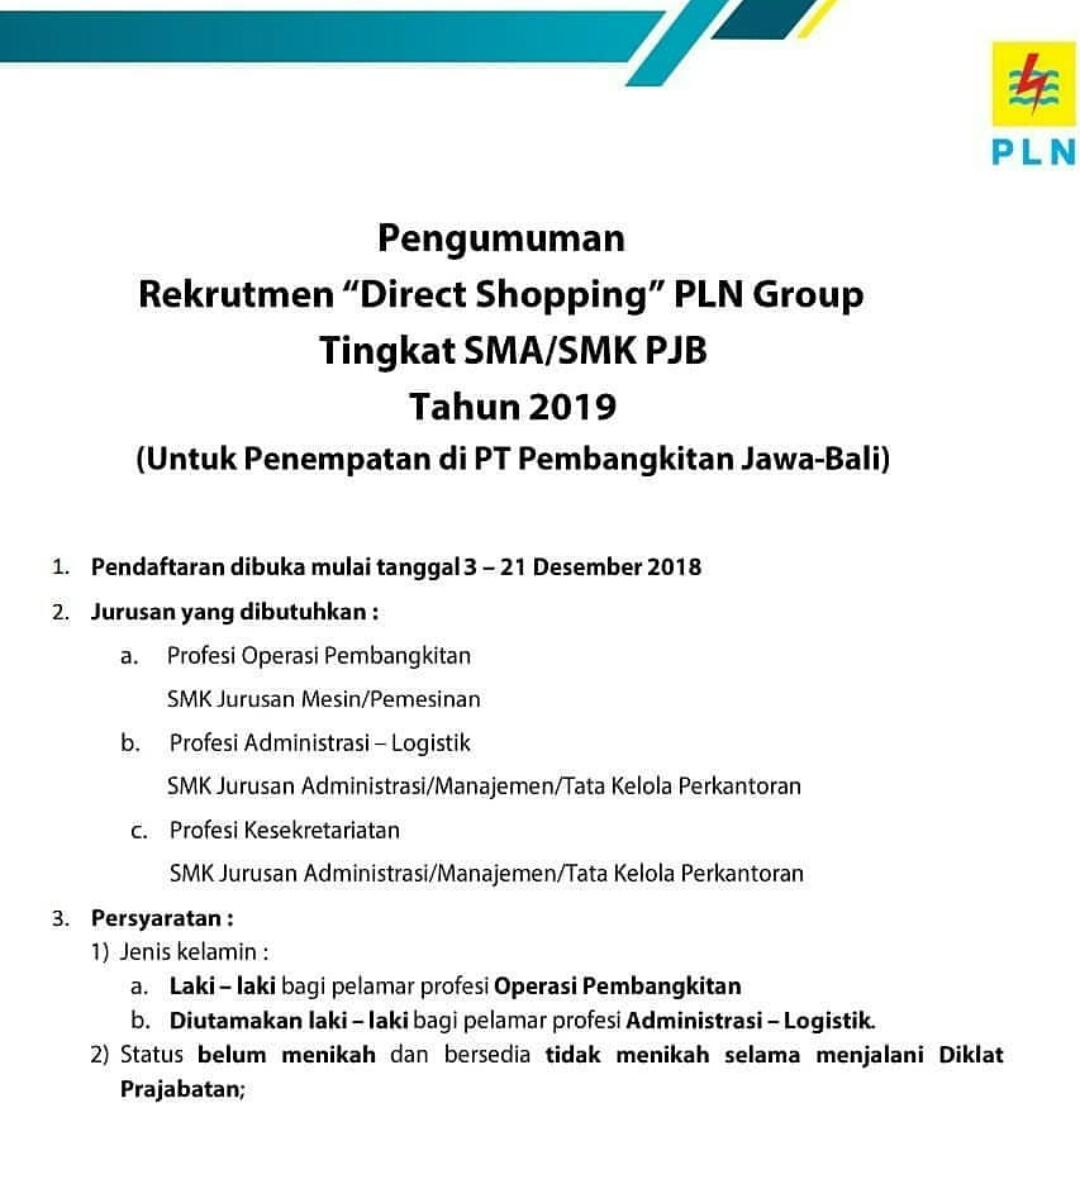 Lowongan Kerja Lowongan Kerja Sma Smk Pjb Pt Pln Persero Tahun 2019